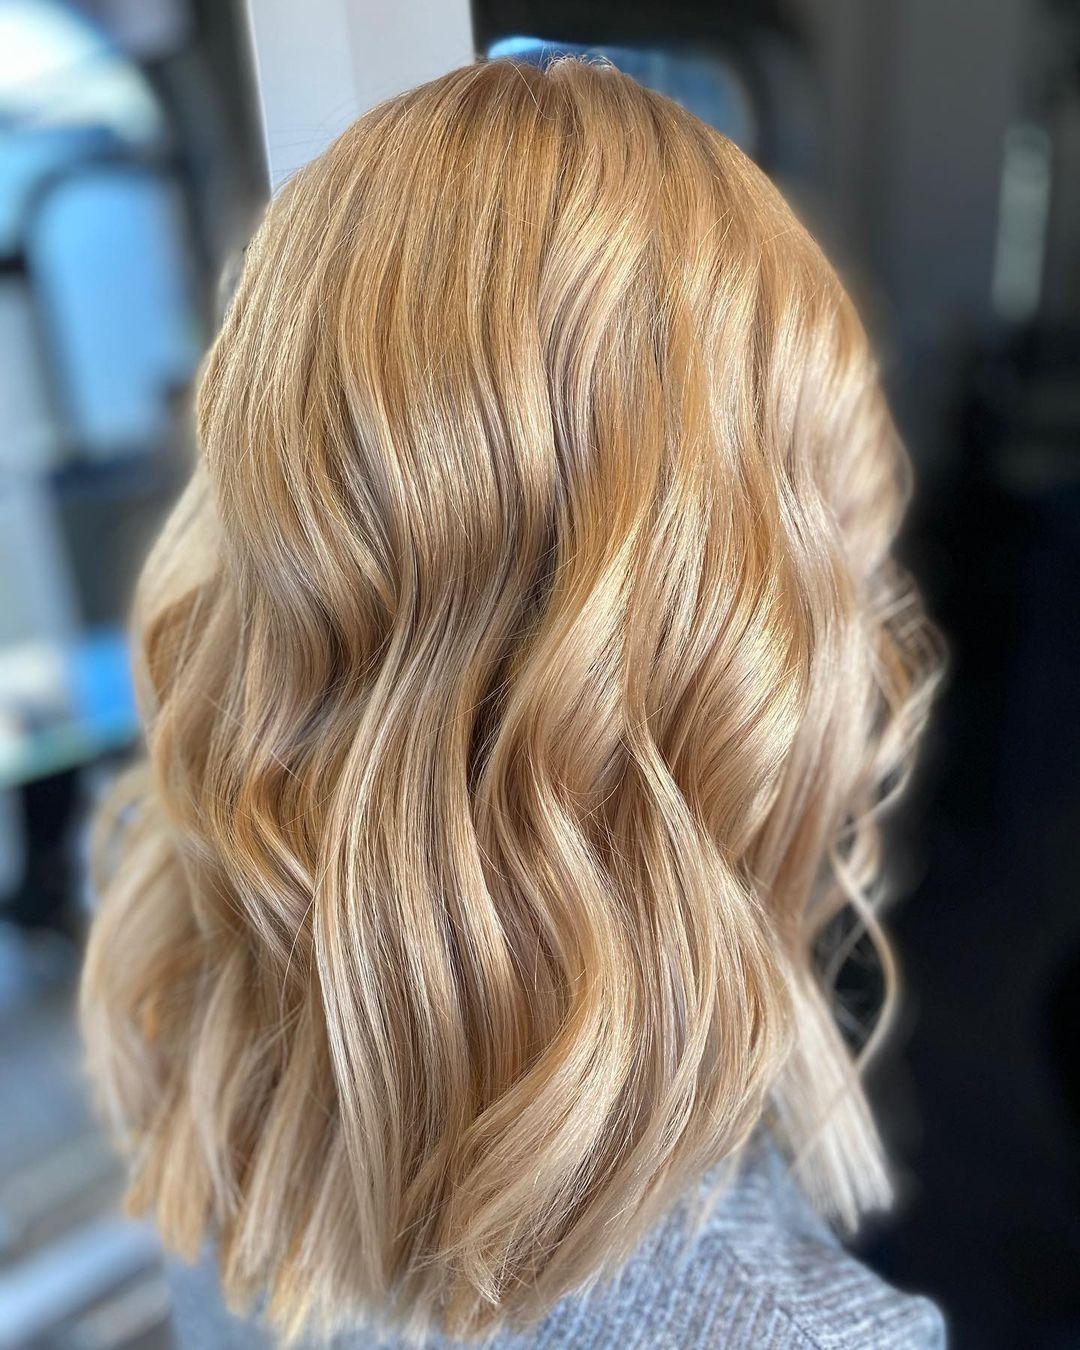 Semi-Curvy Golden Waves Hairdo